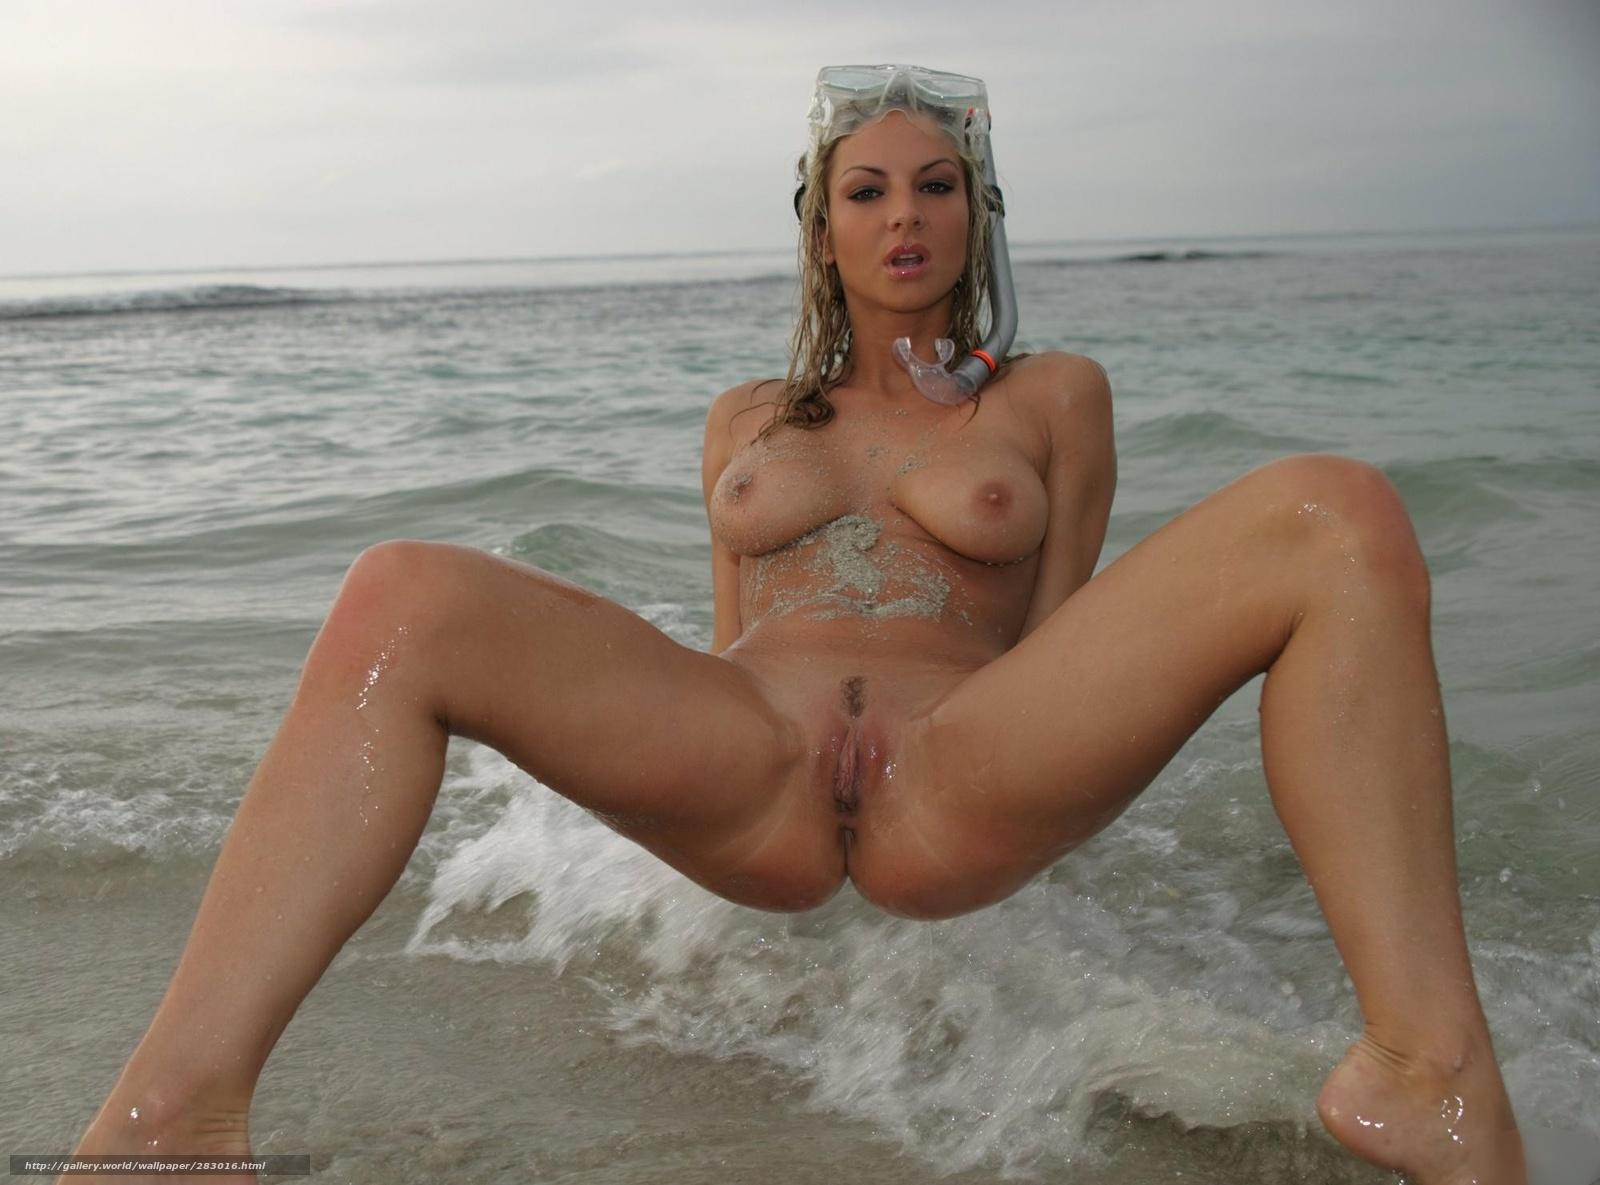 Секс красавицы на пляже 6 фотография